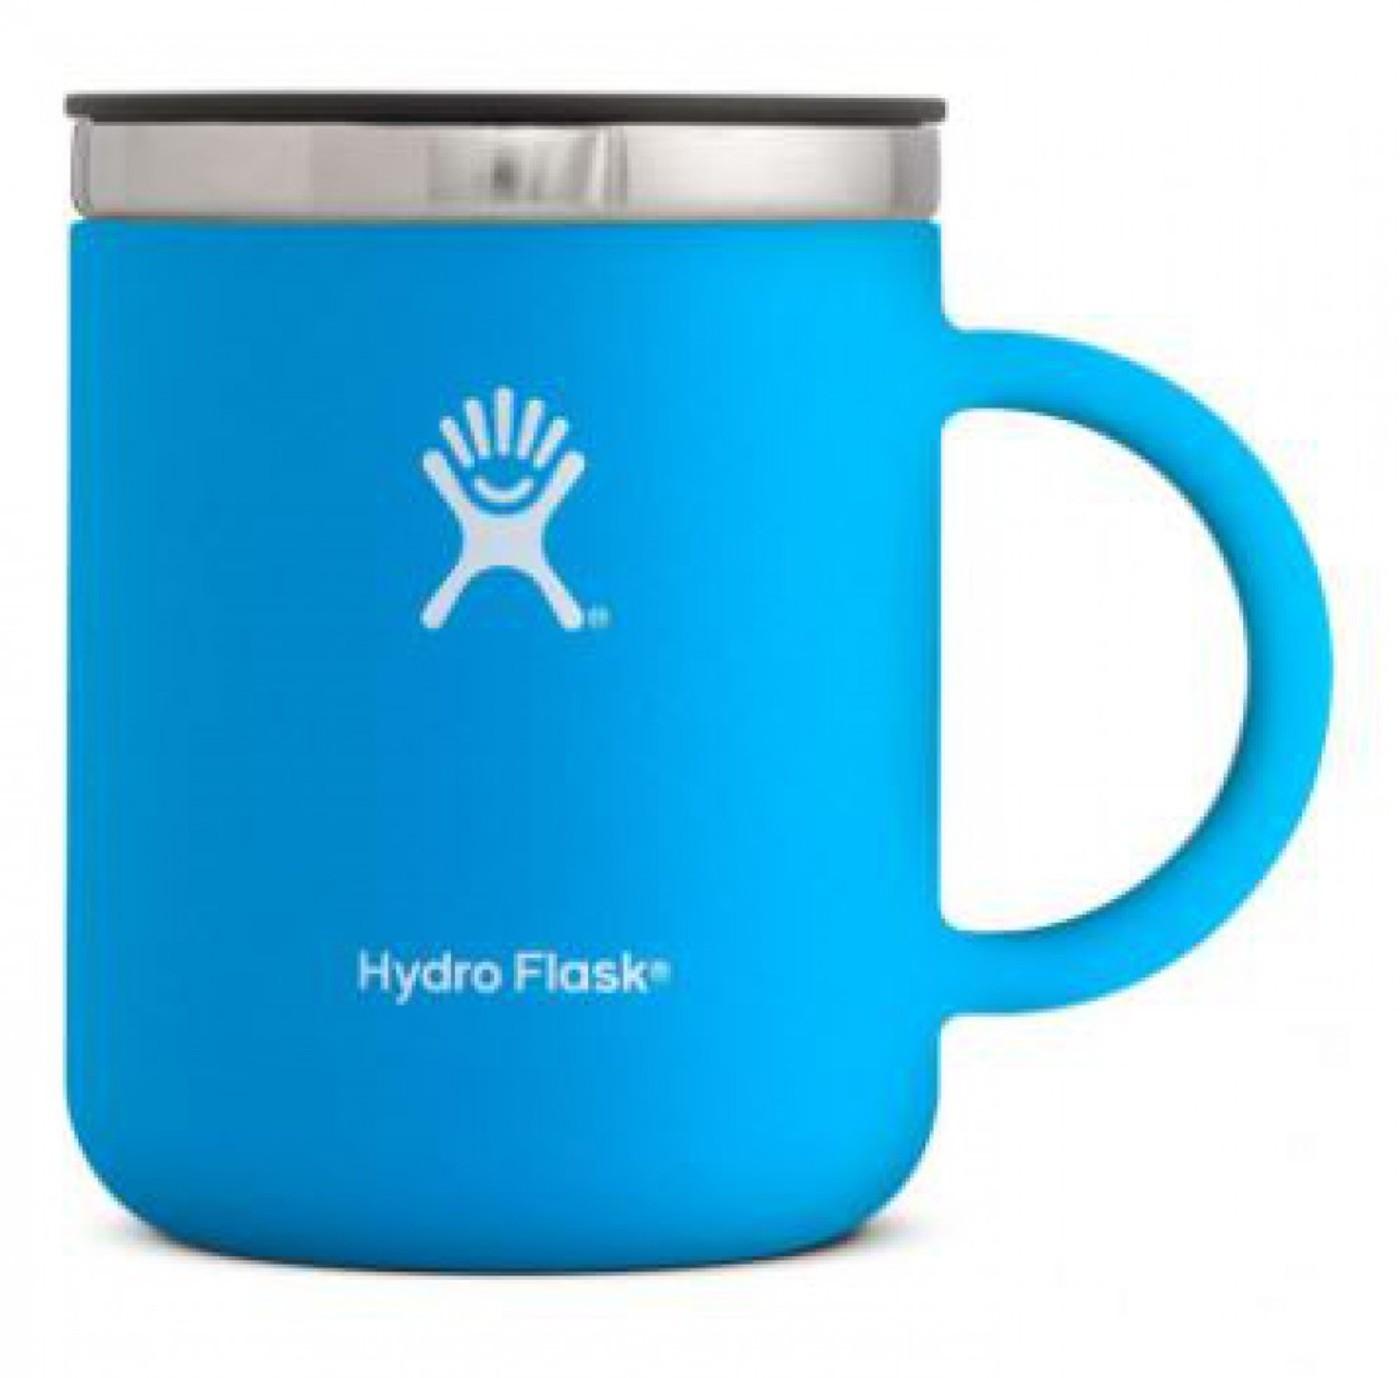 HYDRO FLASK COFFEE MUG 12 OZ